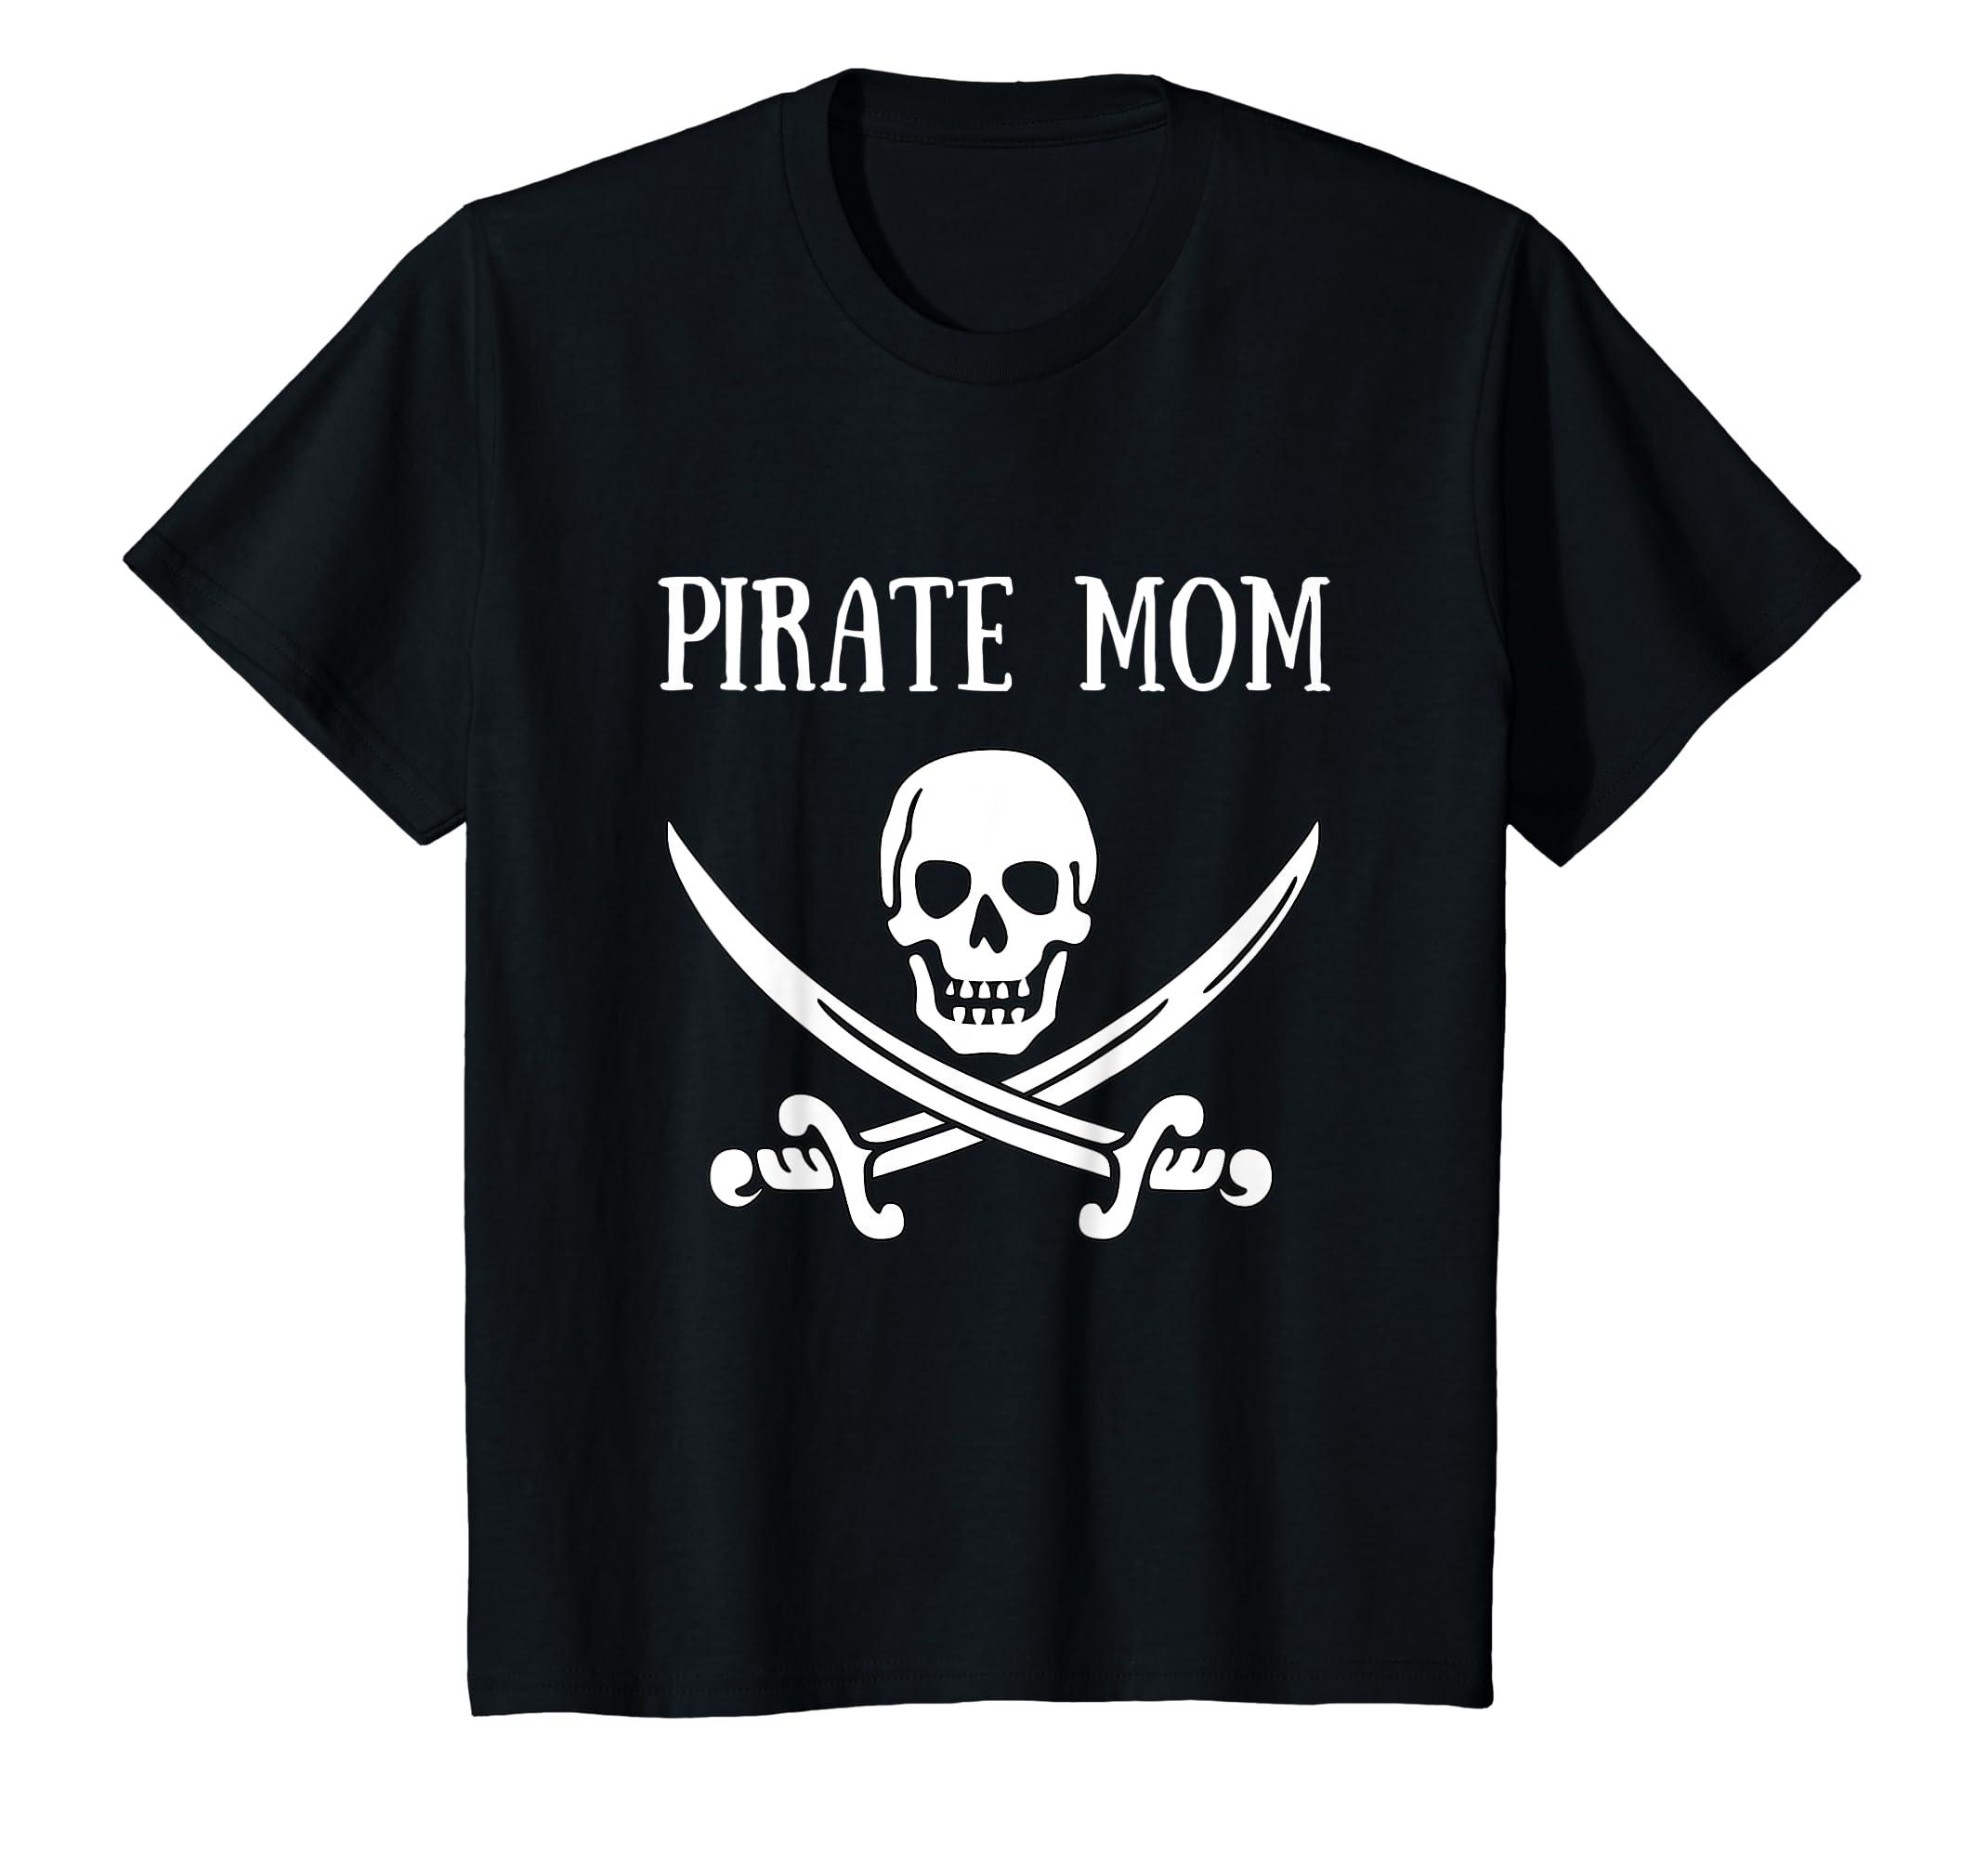 Amazon.com  Pirate Mom Shirt Pirate Family Shirts Family Matching Shirts   Clothing 982dac084